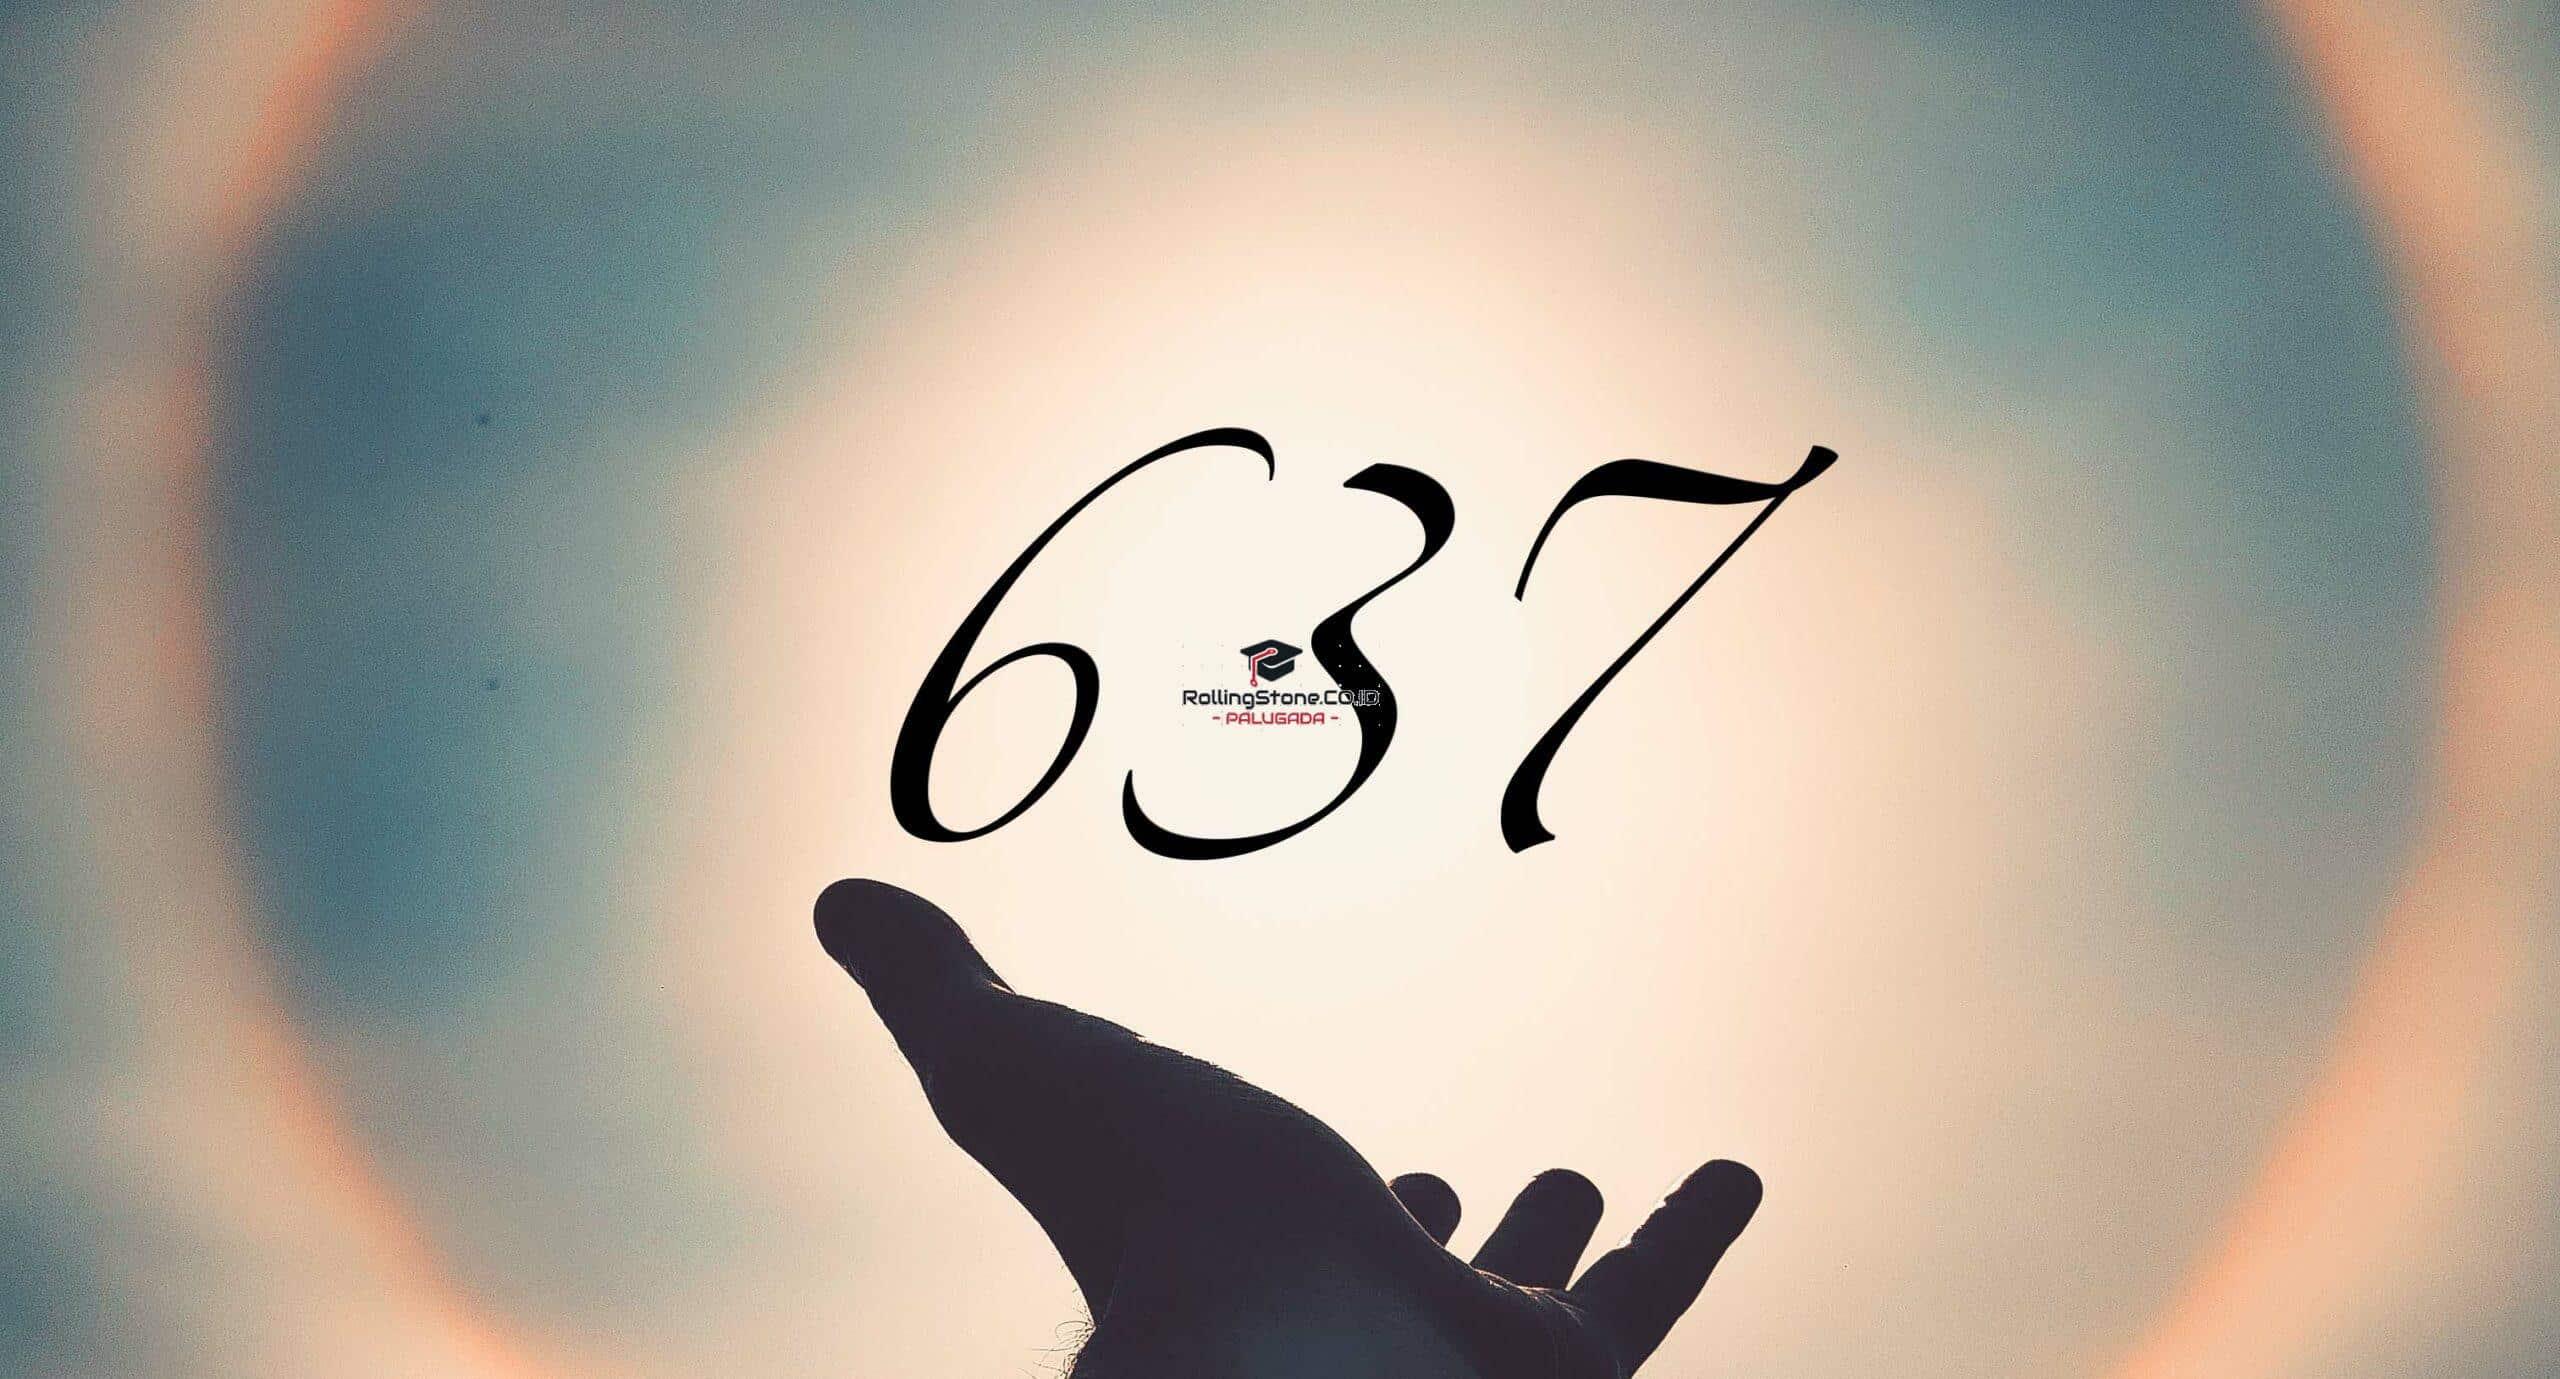 Apa-Itu-Kode-637-Meaning-scaled